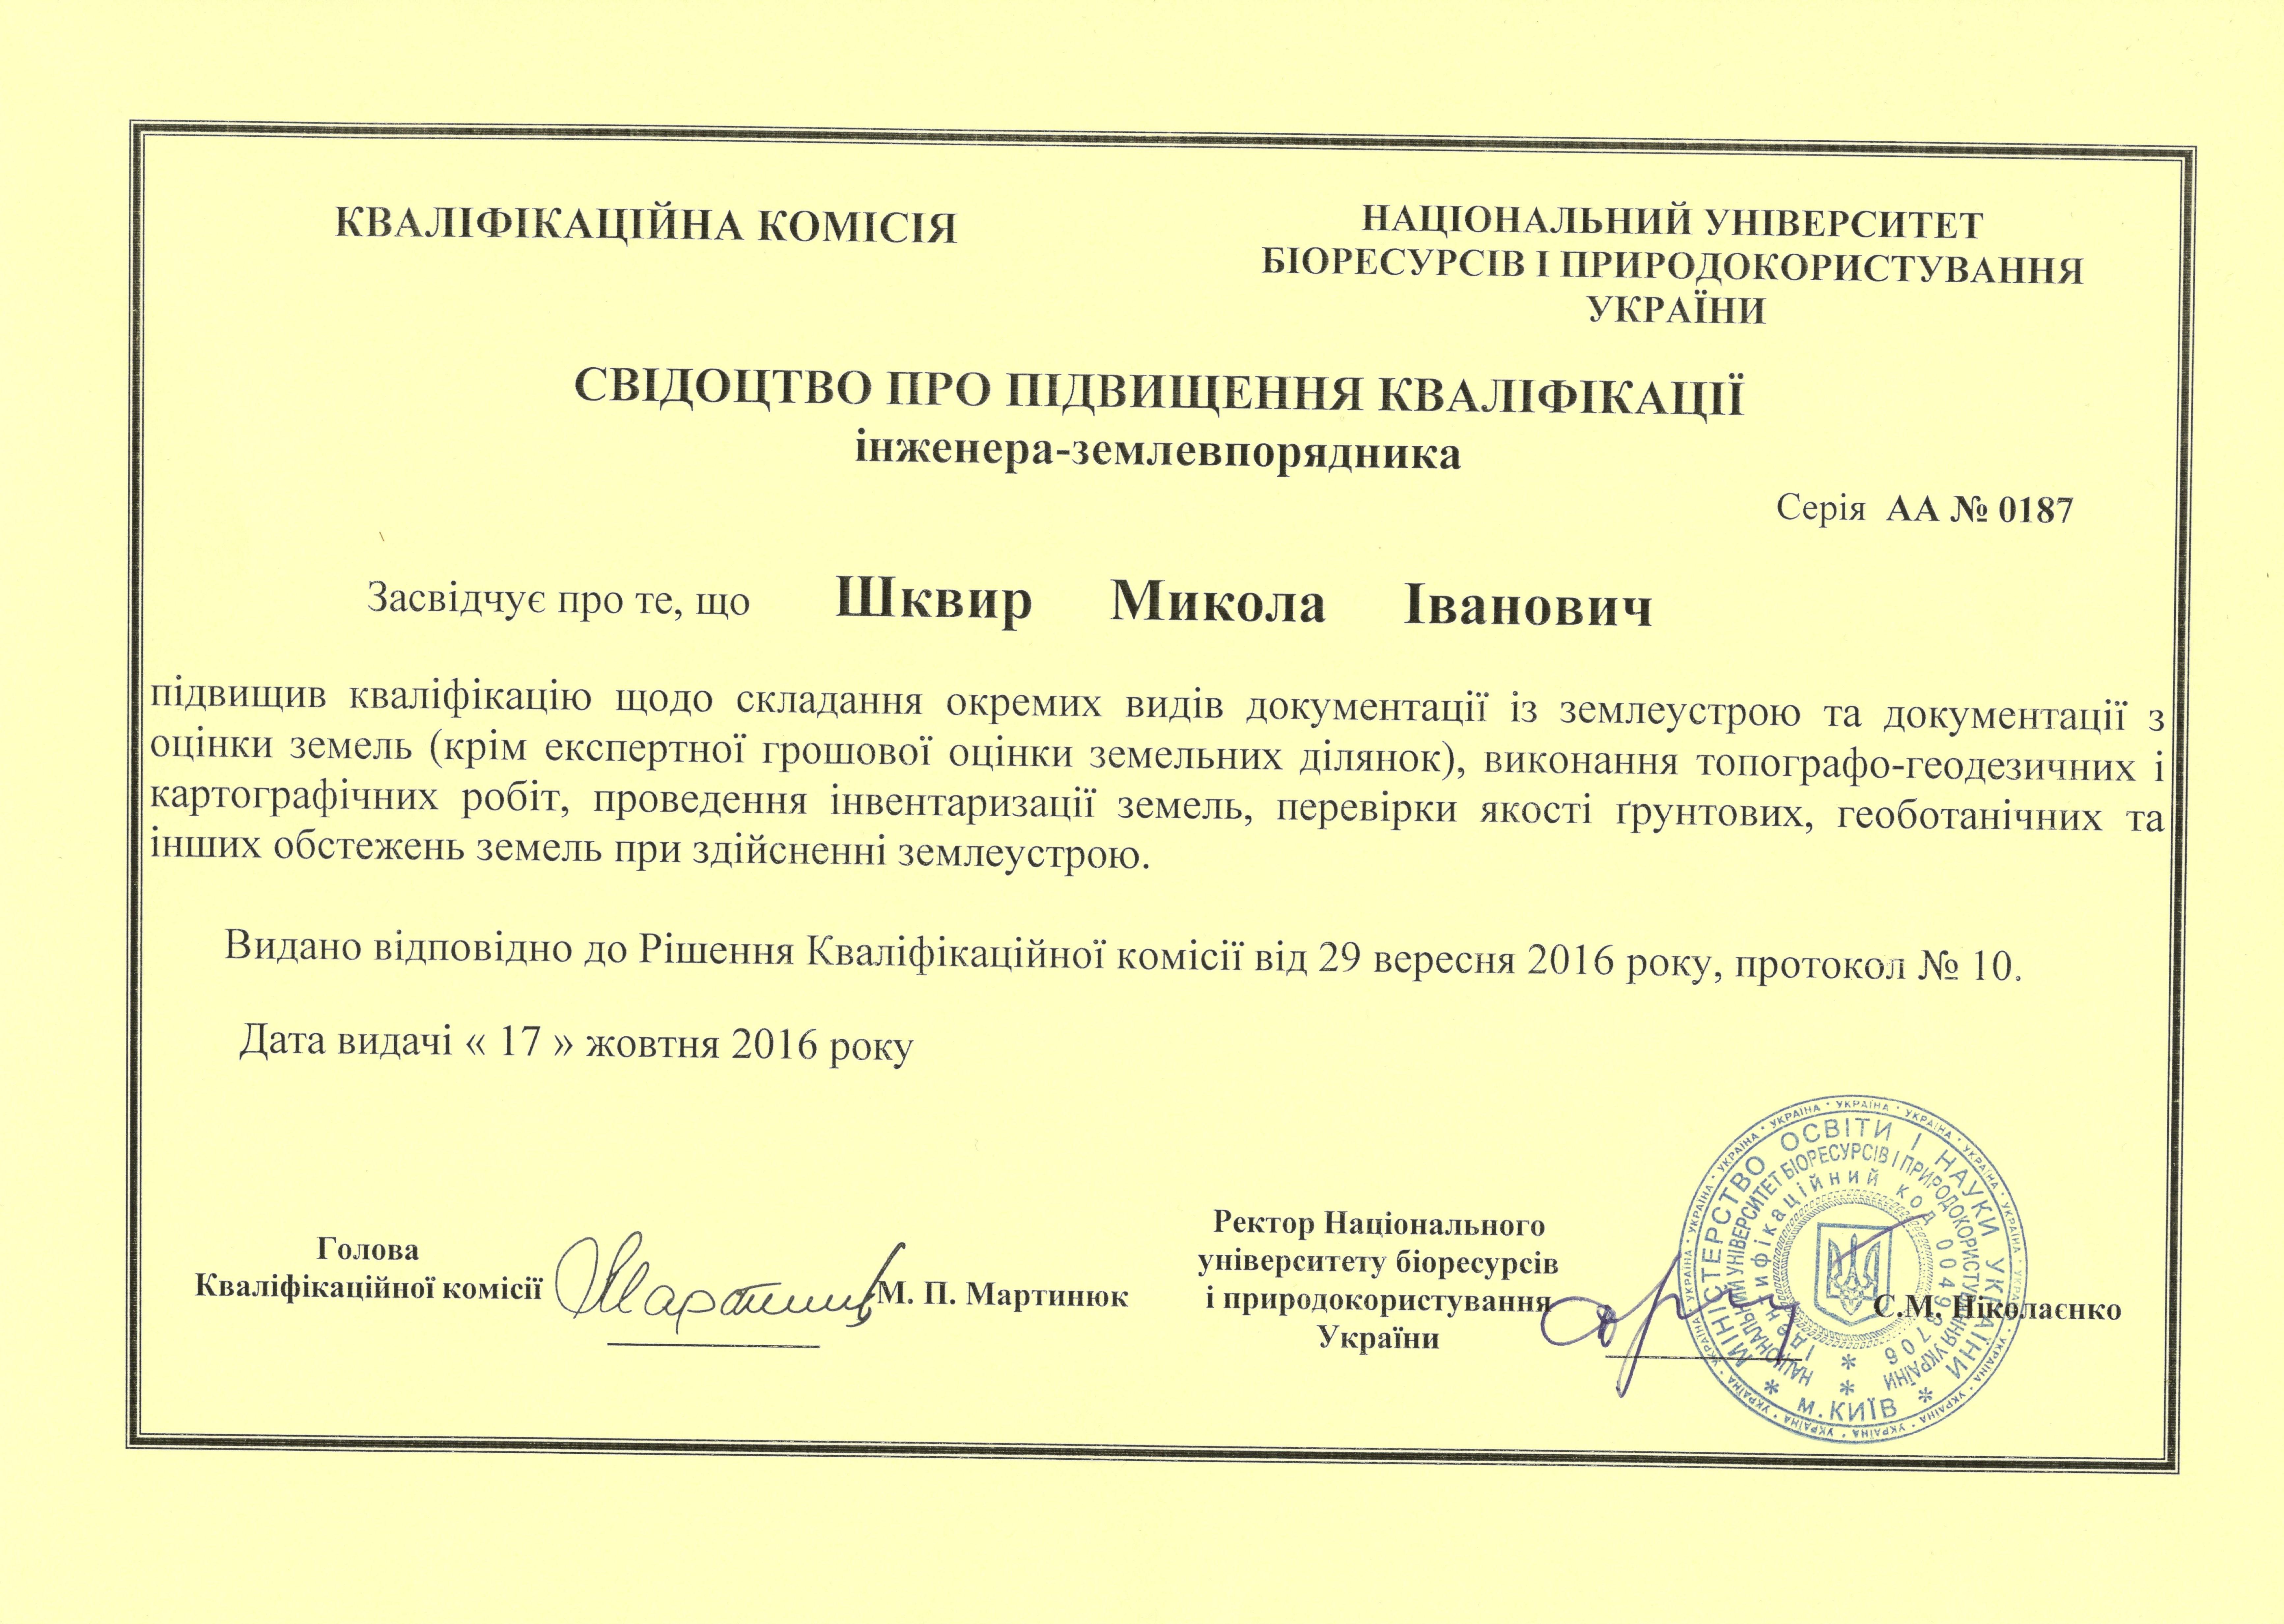 http://www.geosektor.com/wp-content/uploads/2017/03/Svidotstvo-pro-pidvishhennya-kvalifikatsiyi-SHkvir-M.I..jpg